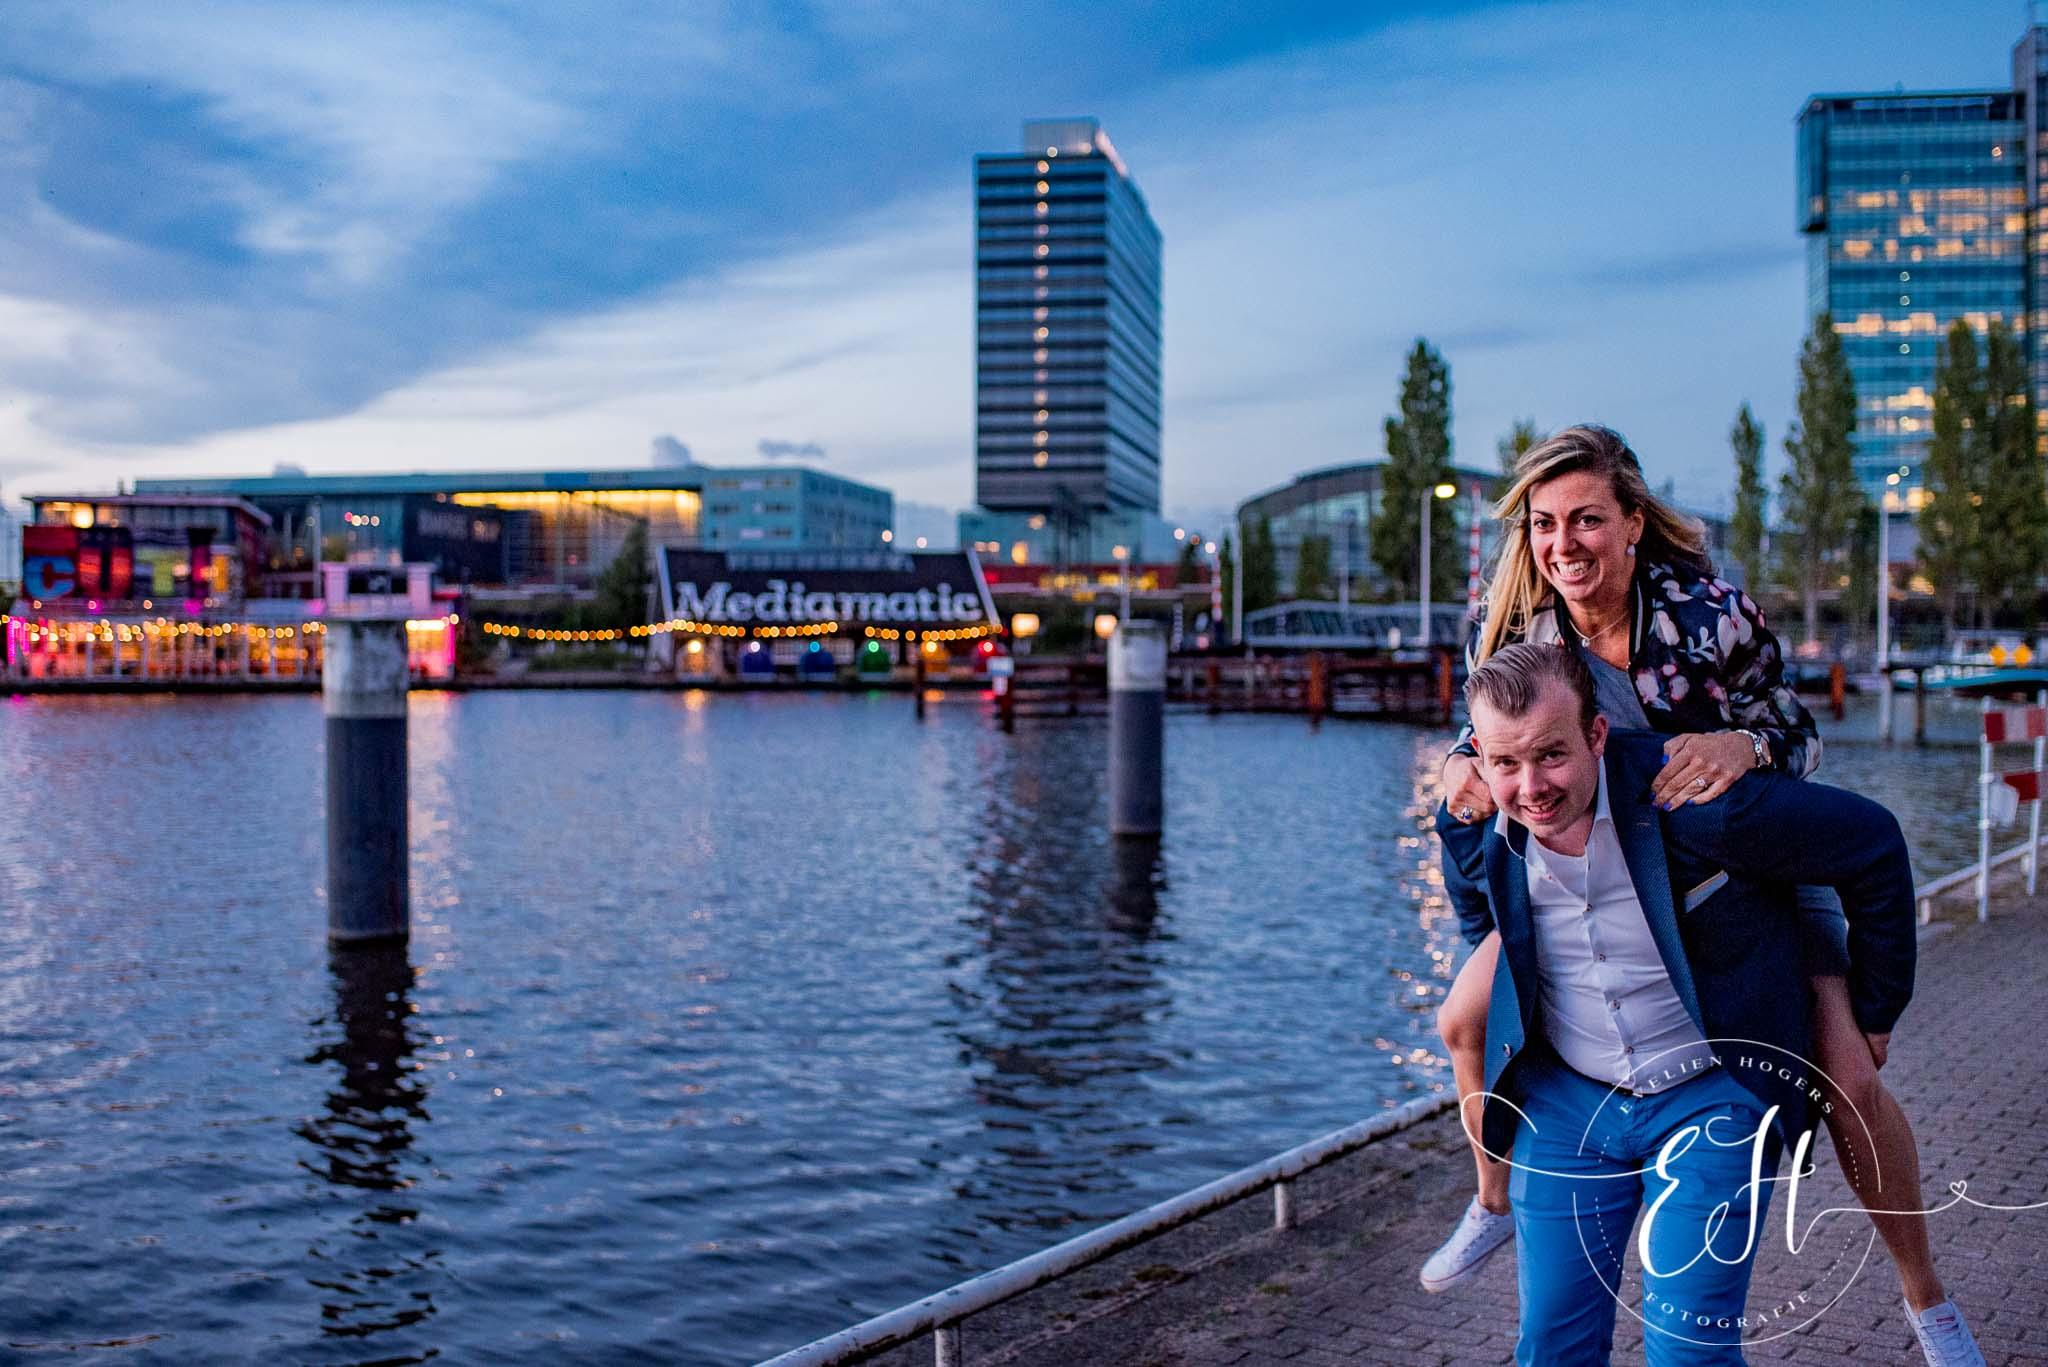 loveshoot-in-amsterdam-evelien-hogers-fotografie (19 van 26).jpg